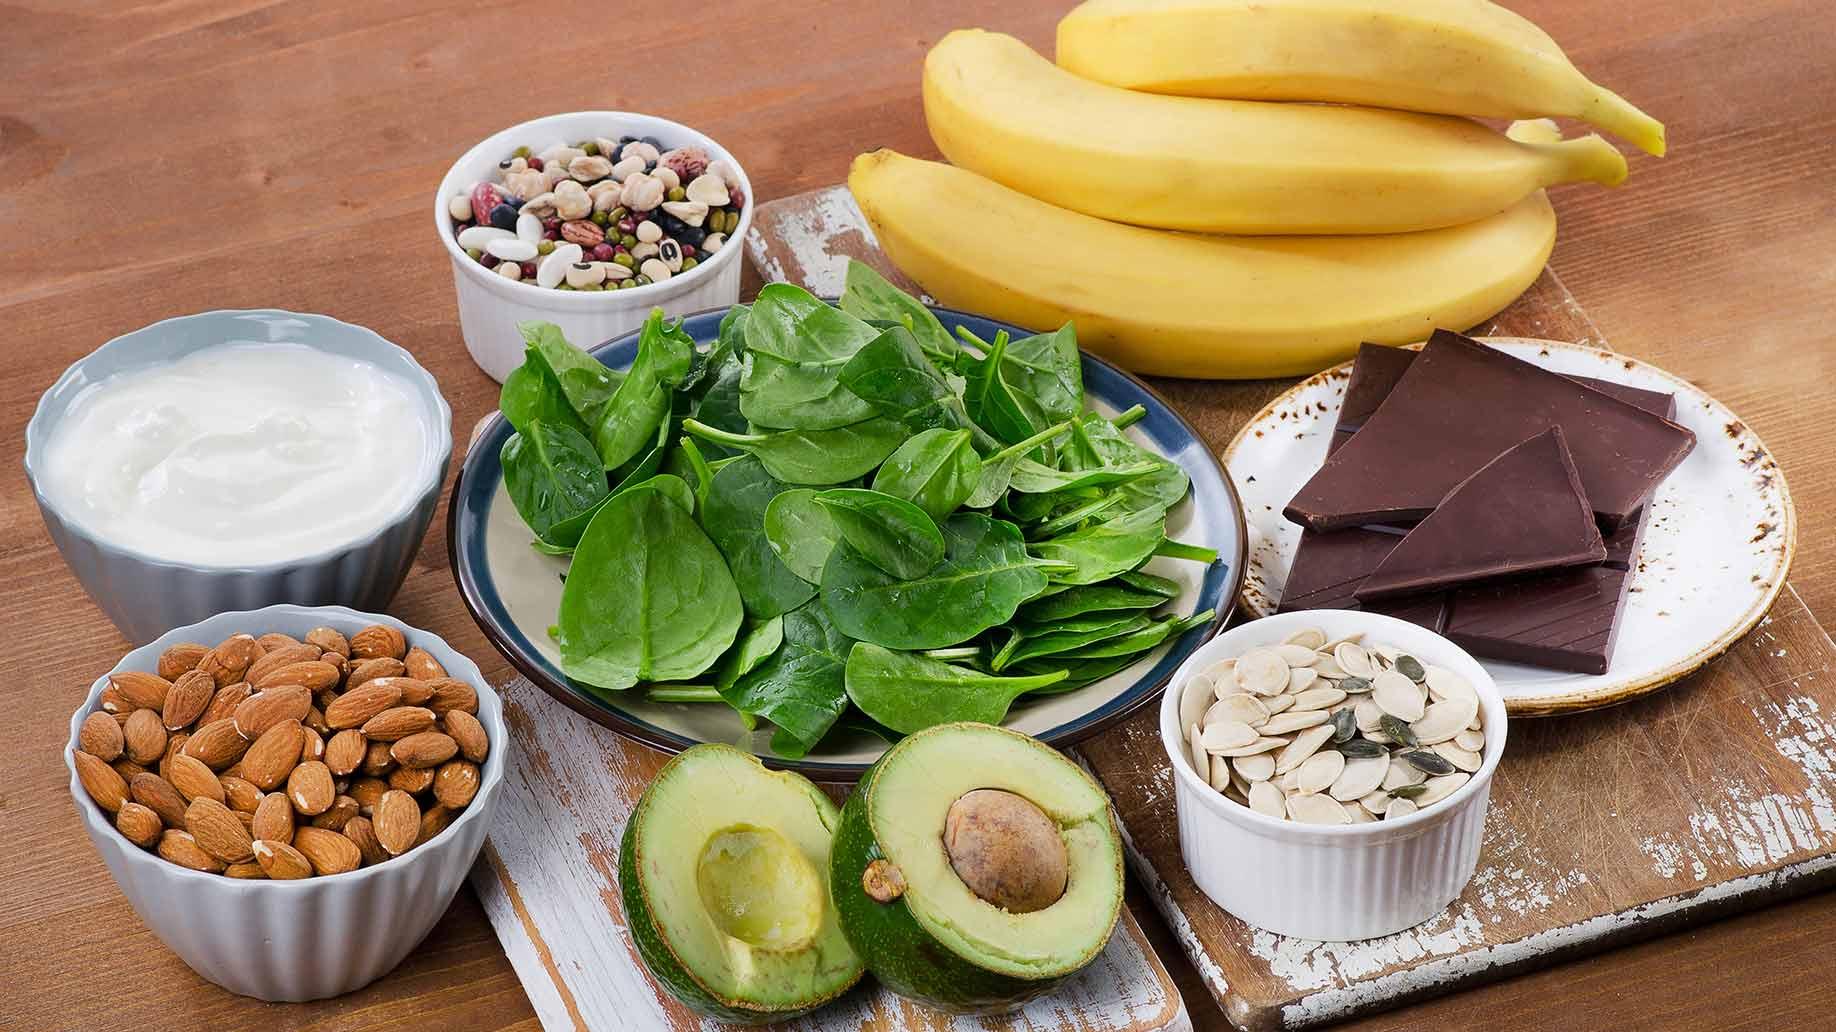 magnesium bananas seeds nuts green leafy vegetables almonds yogurt dark chocolate avocado insomnia sleep disorder natural remedies aid